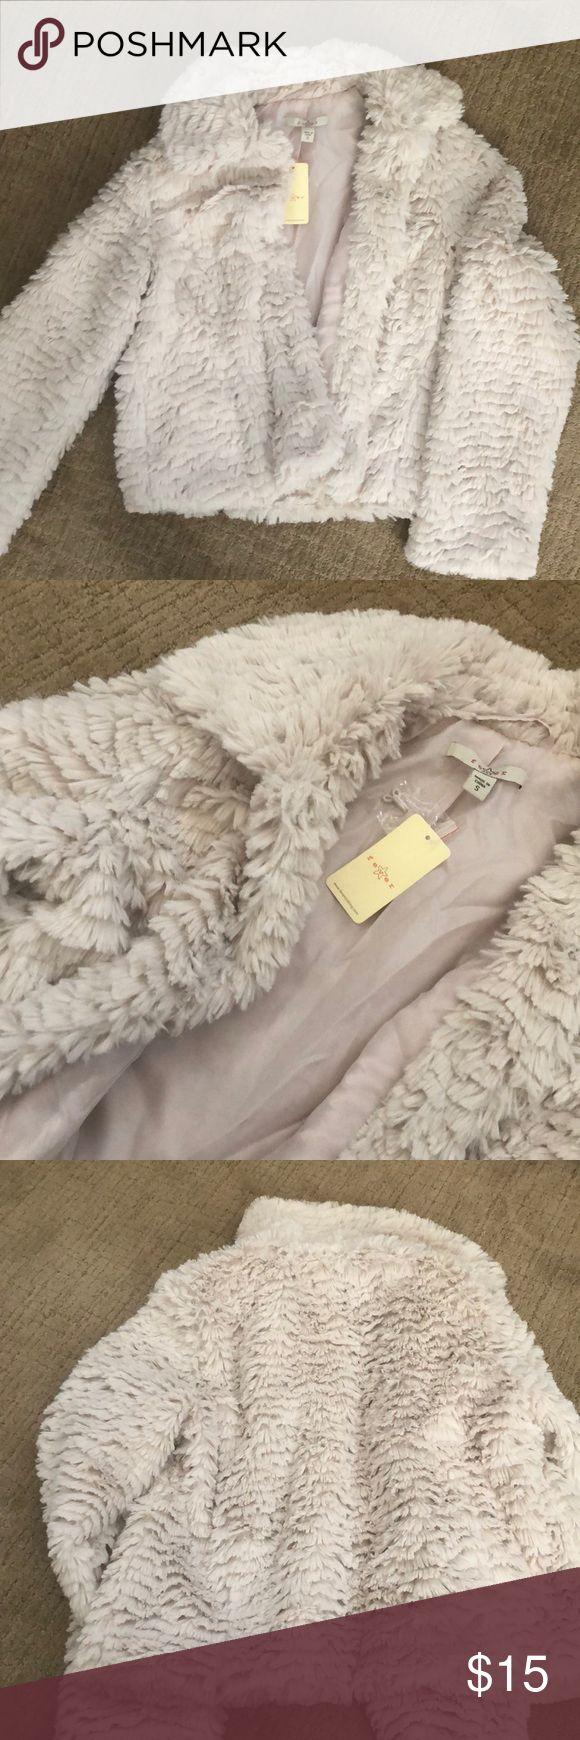 White/cream faux fur coat New white/cream faux fur coat Fever Jackets & Coats